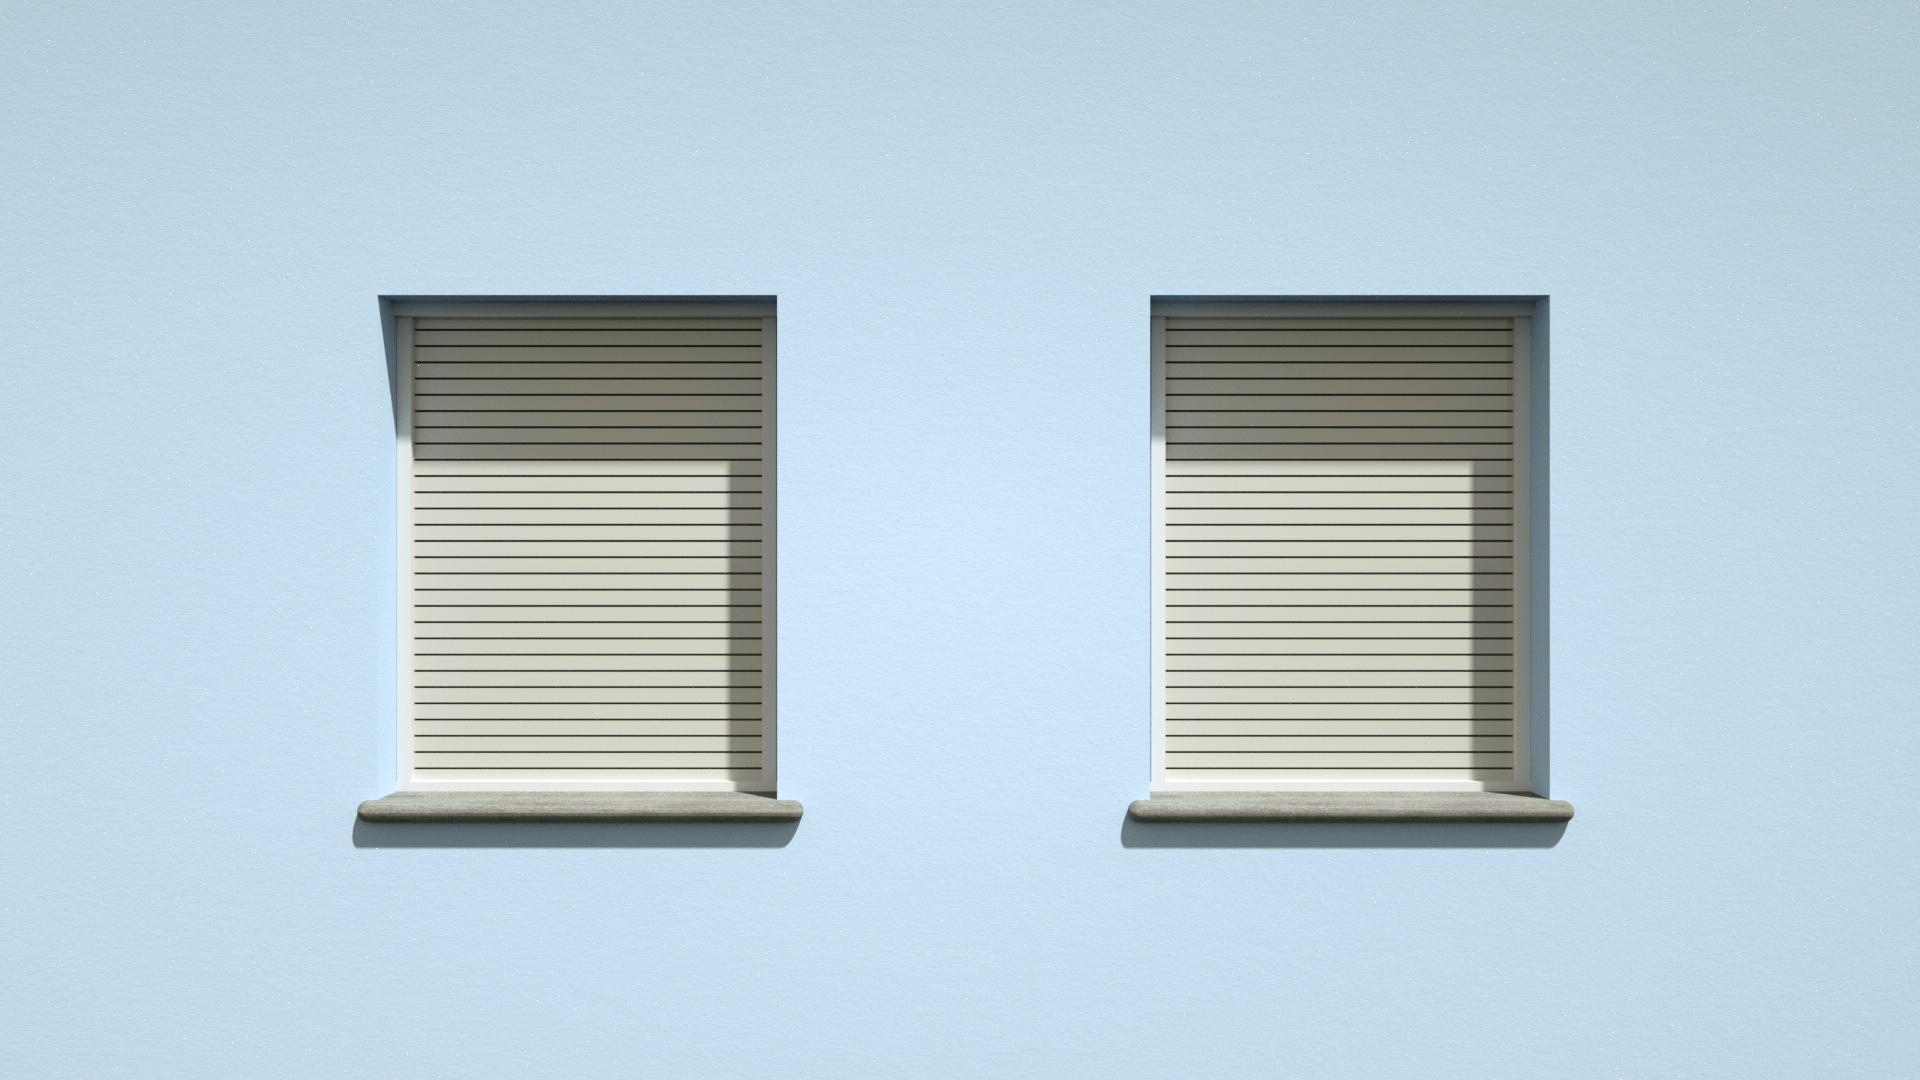 House_Windows.jpg